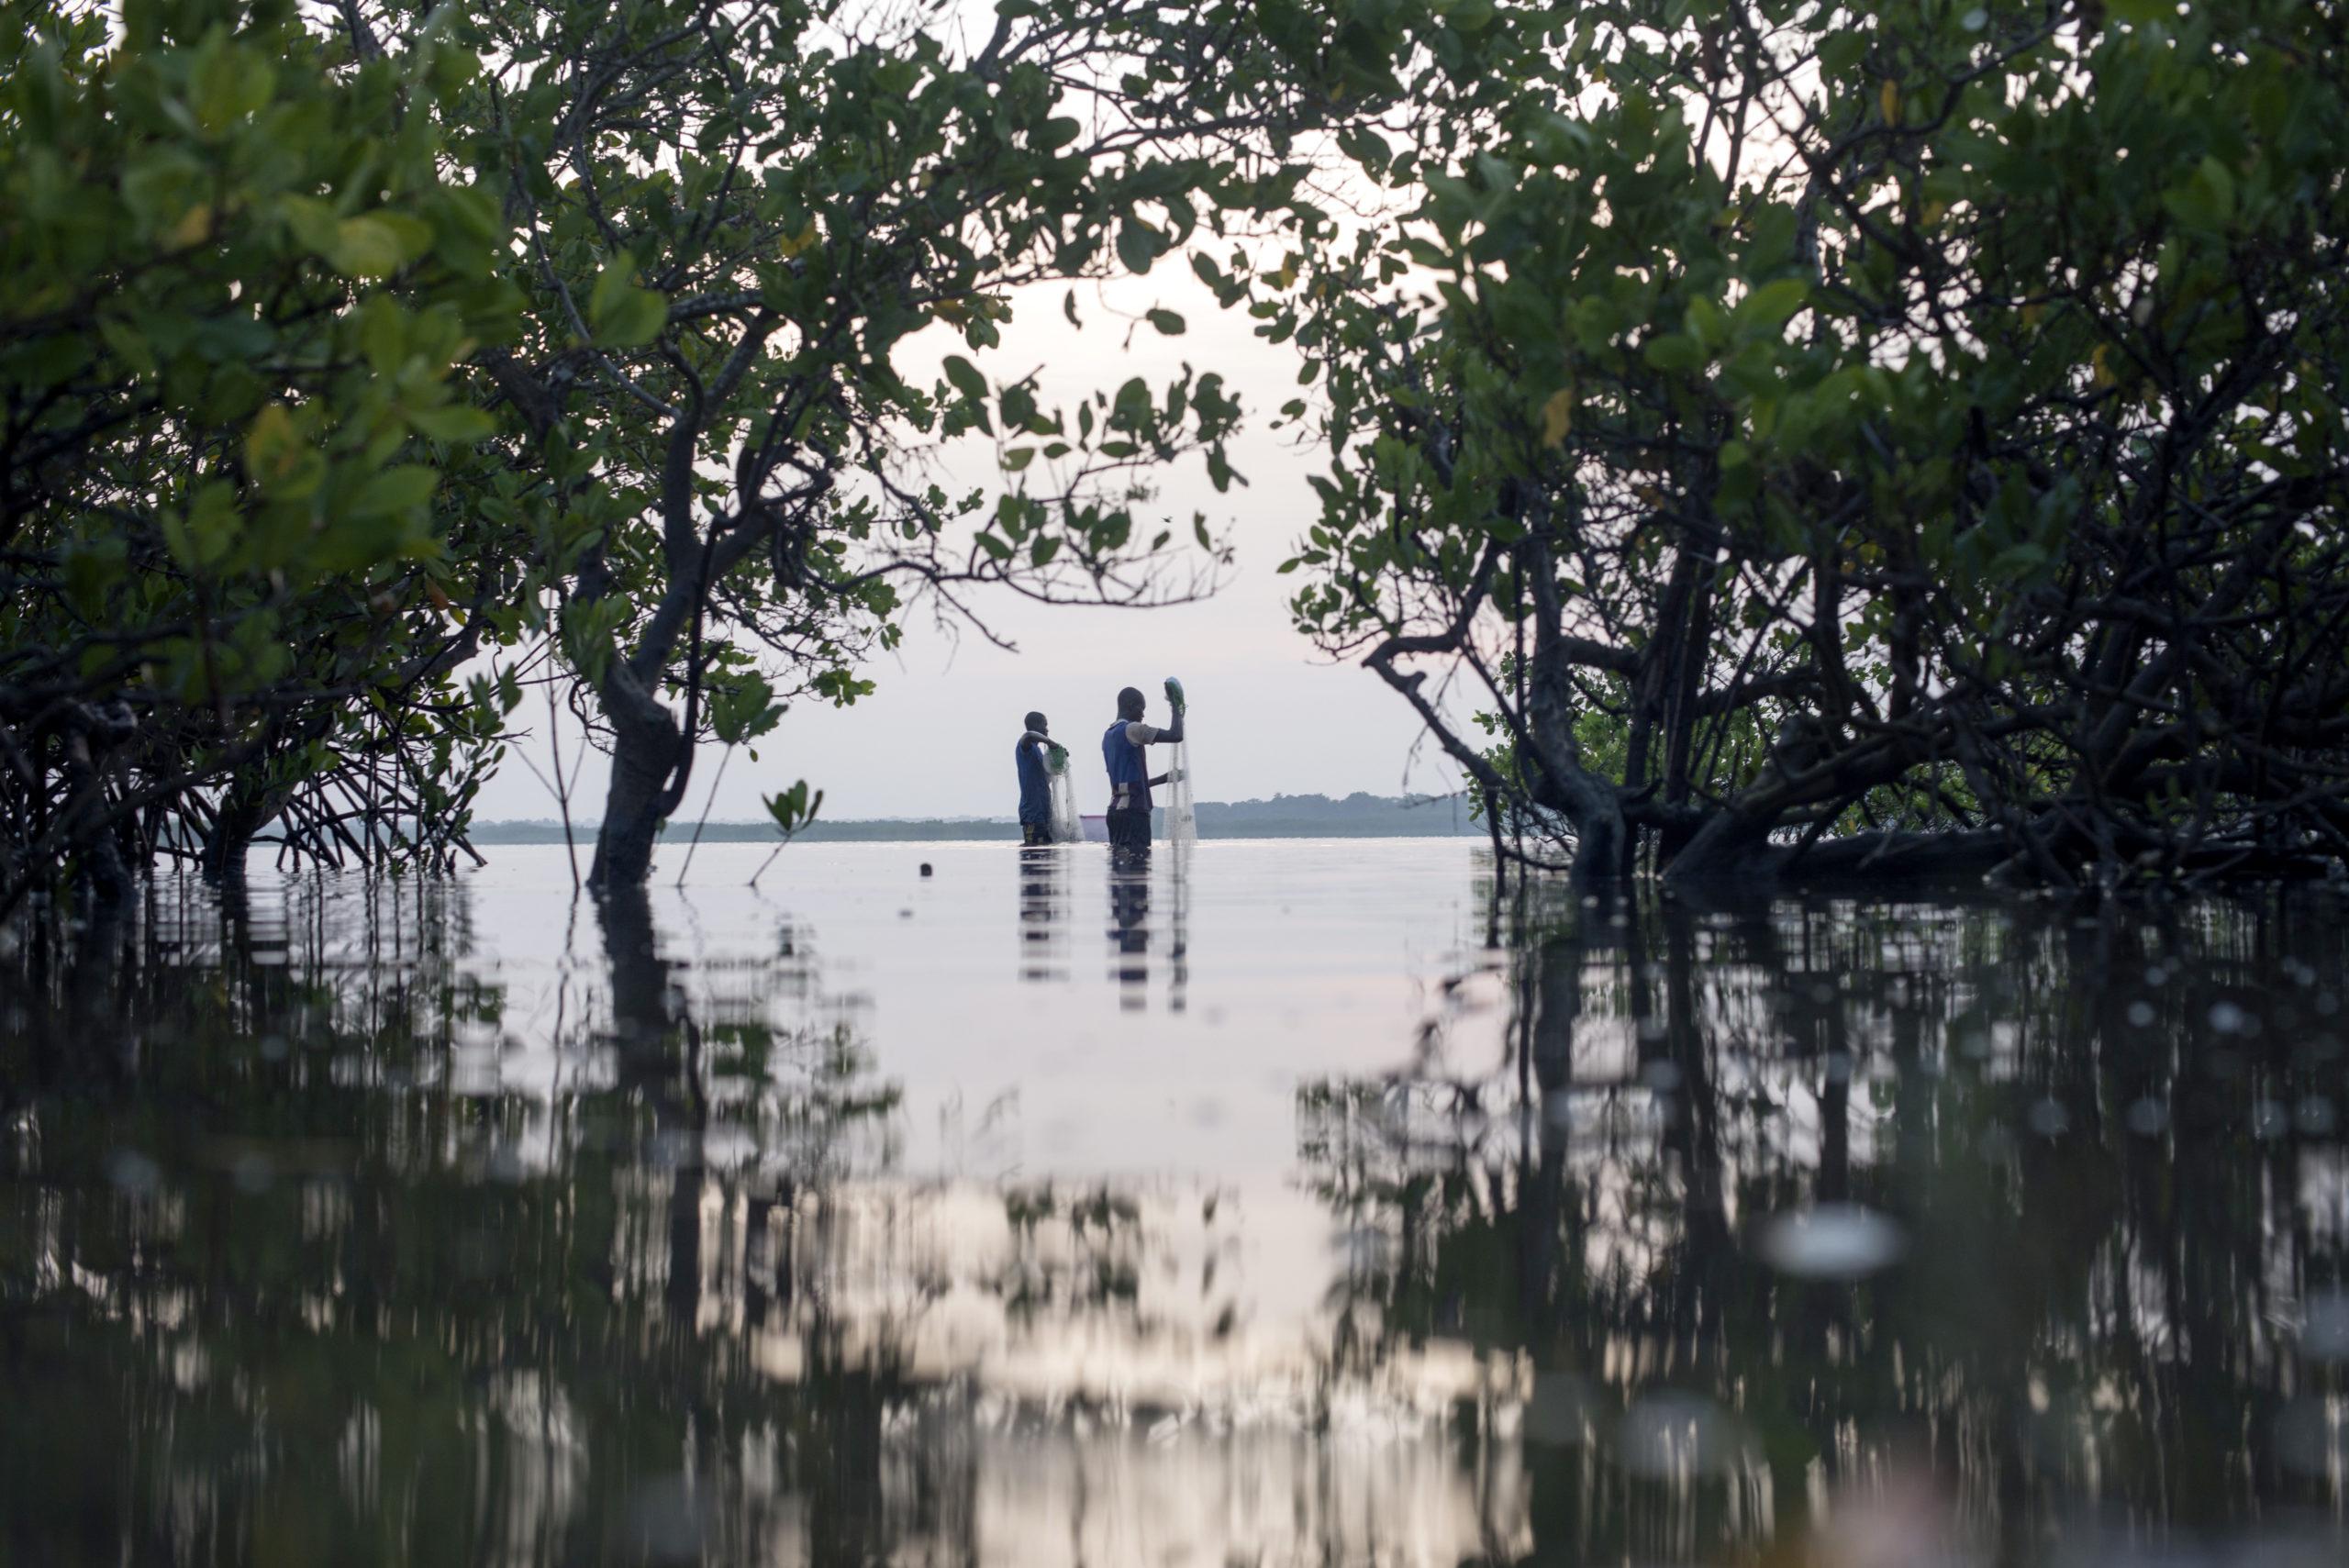 Aquaculture is main driver of mangrove losses